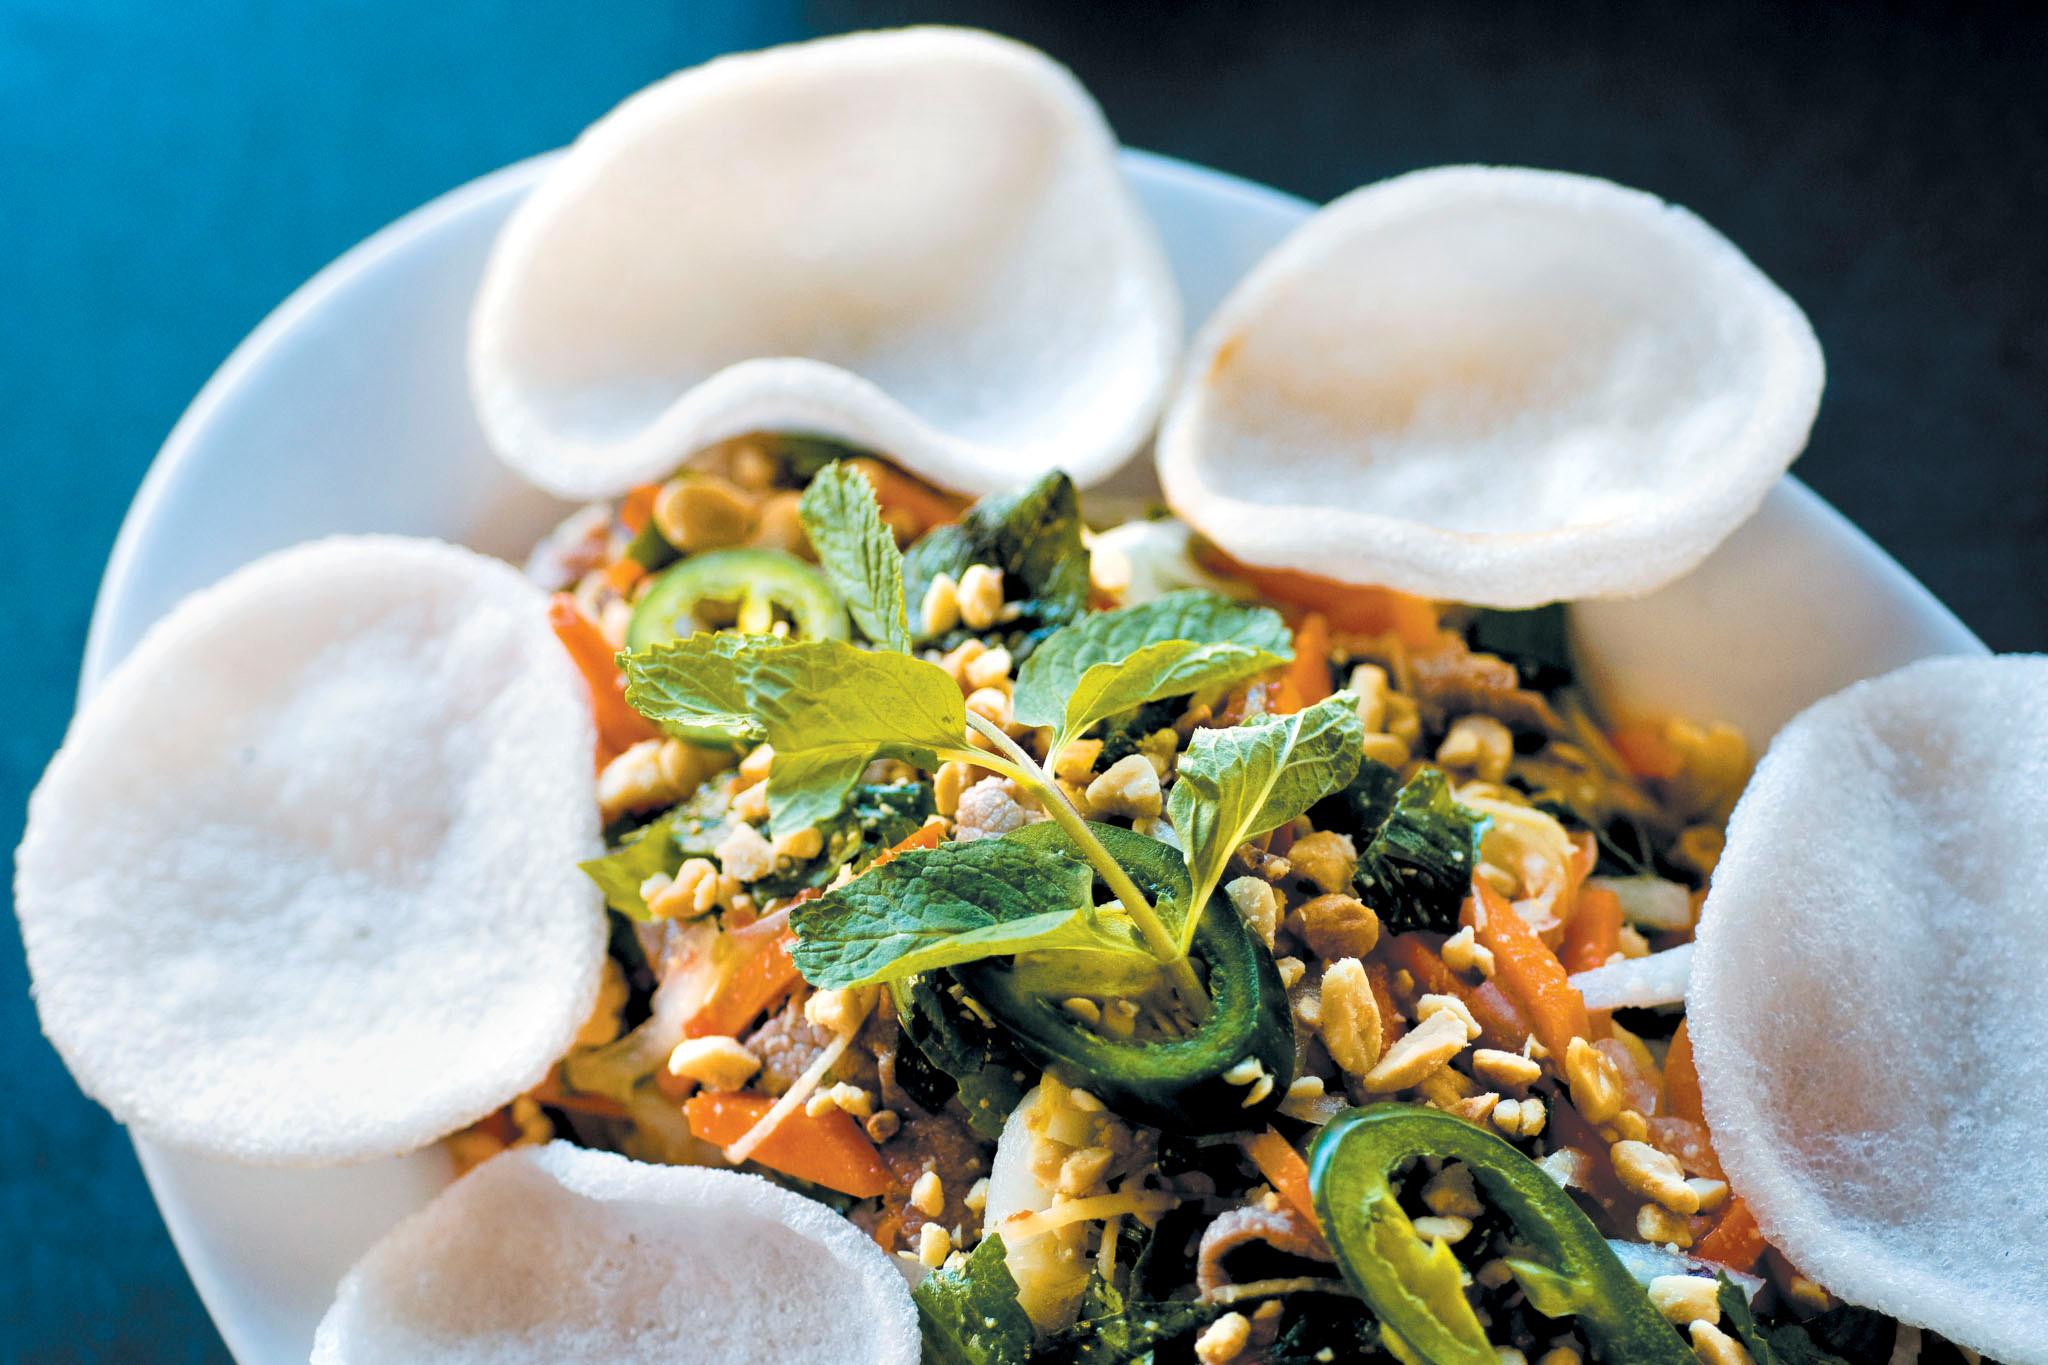 Explore pan-Asian cuisine on Argyle Street